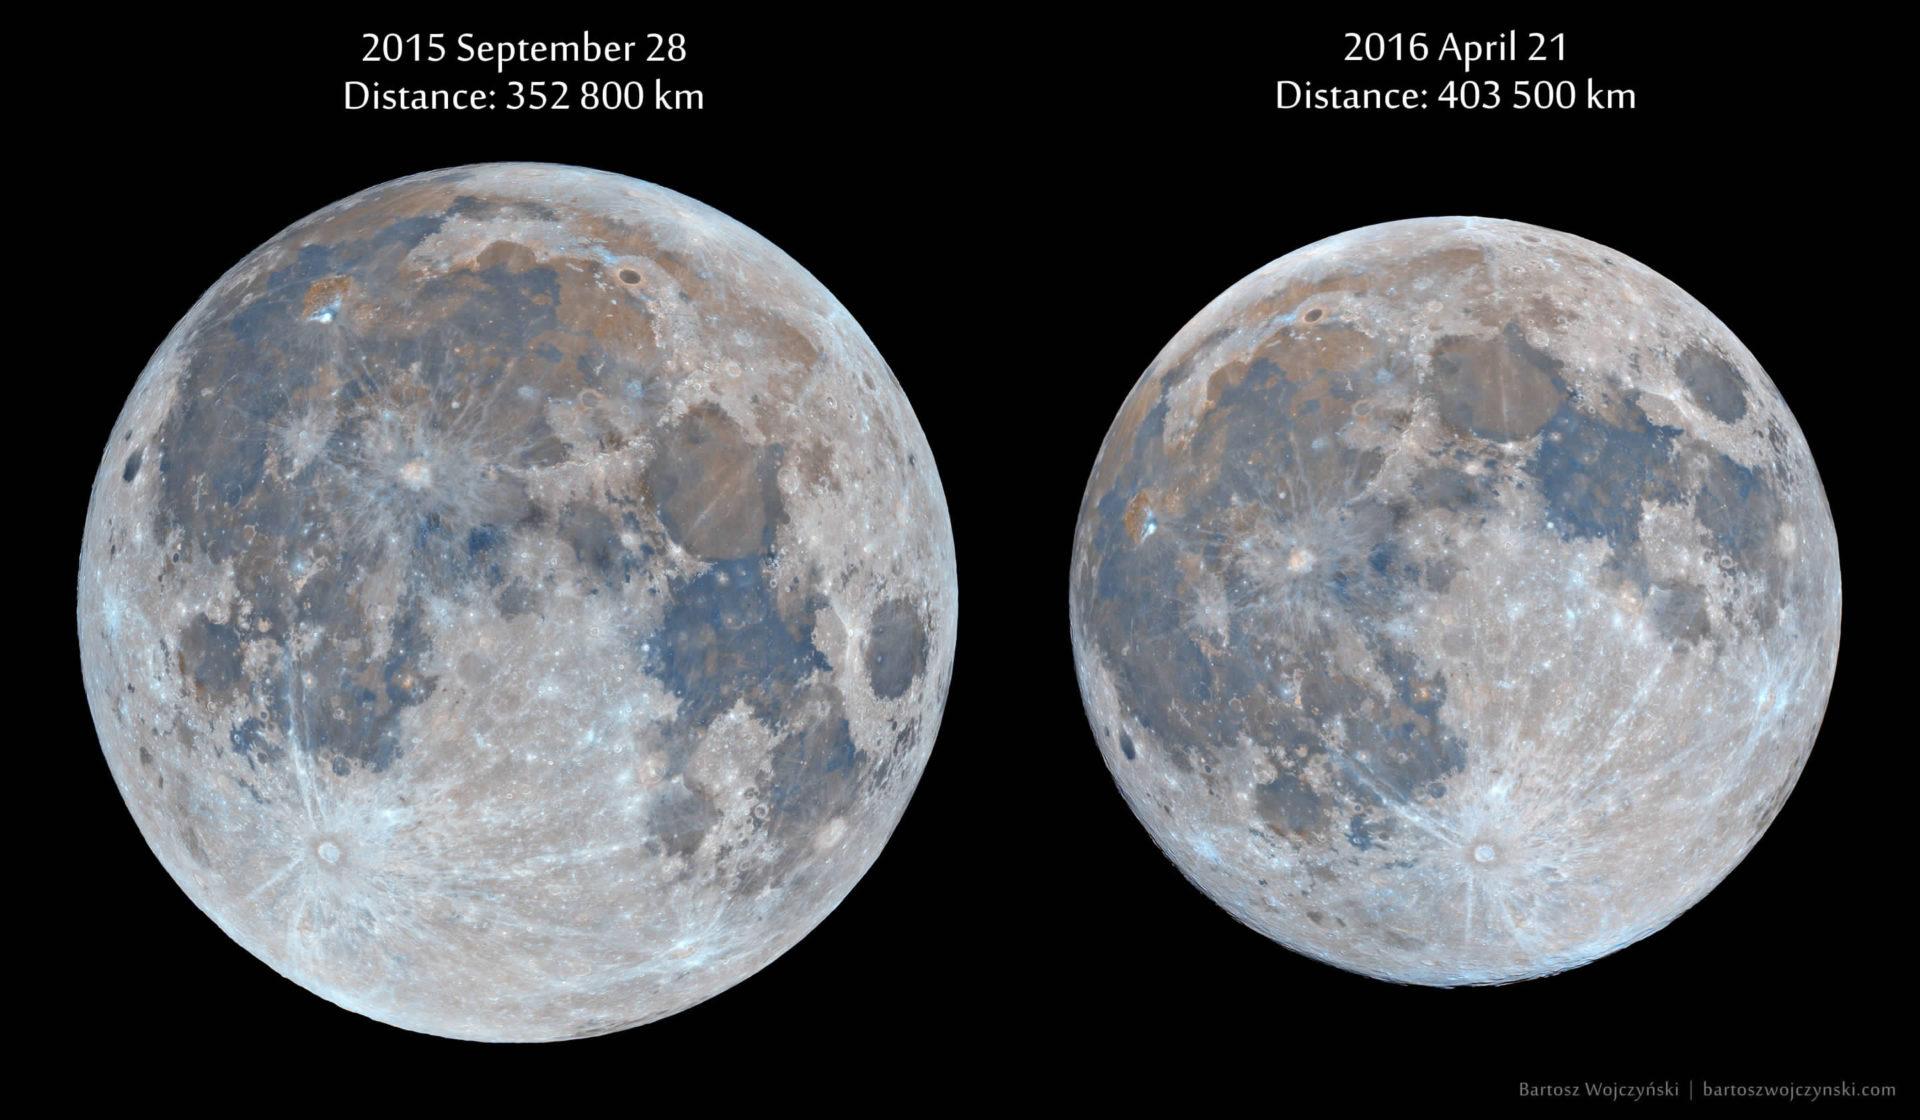 Differenza di diametro apparente della Luna piena al perigeo (28 settembre 2015) e all'apogeo (21 aprile 2016) Credit & Copyright: Bartosz Wojczyński http://i.imgur.com/mLF73KY.jpg